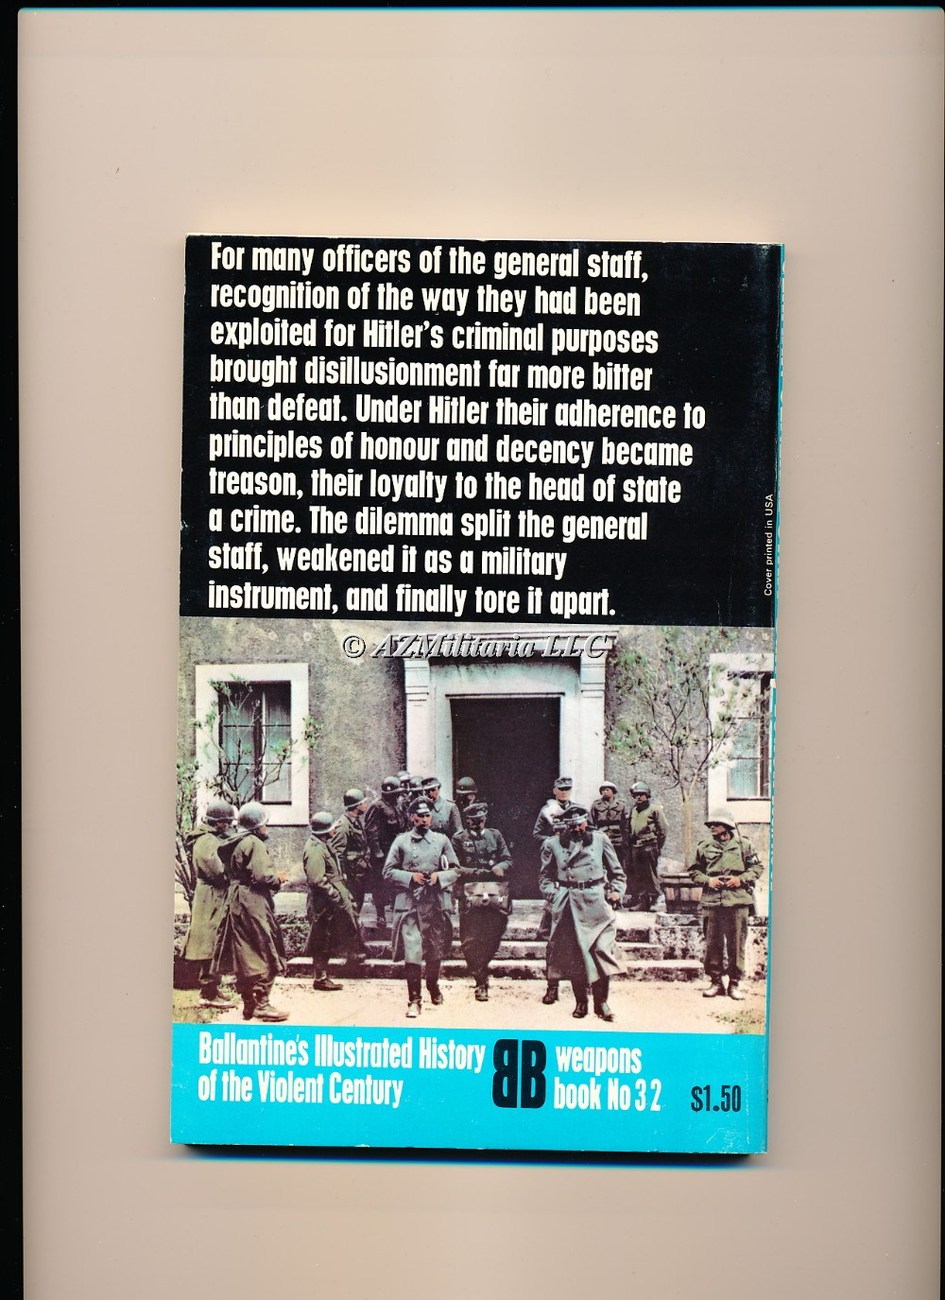 German General Staff (Weapons Book, No 32)